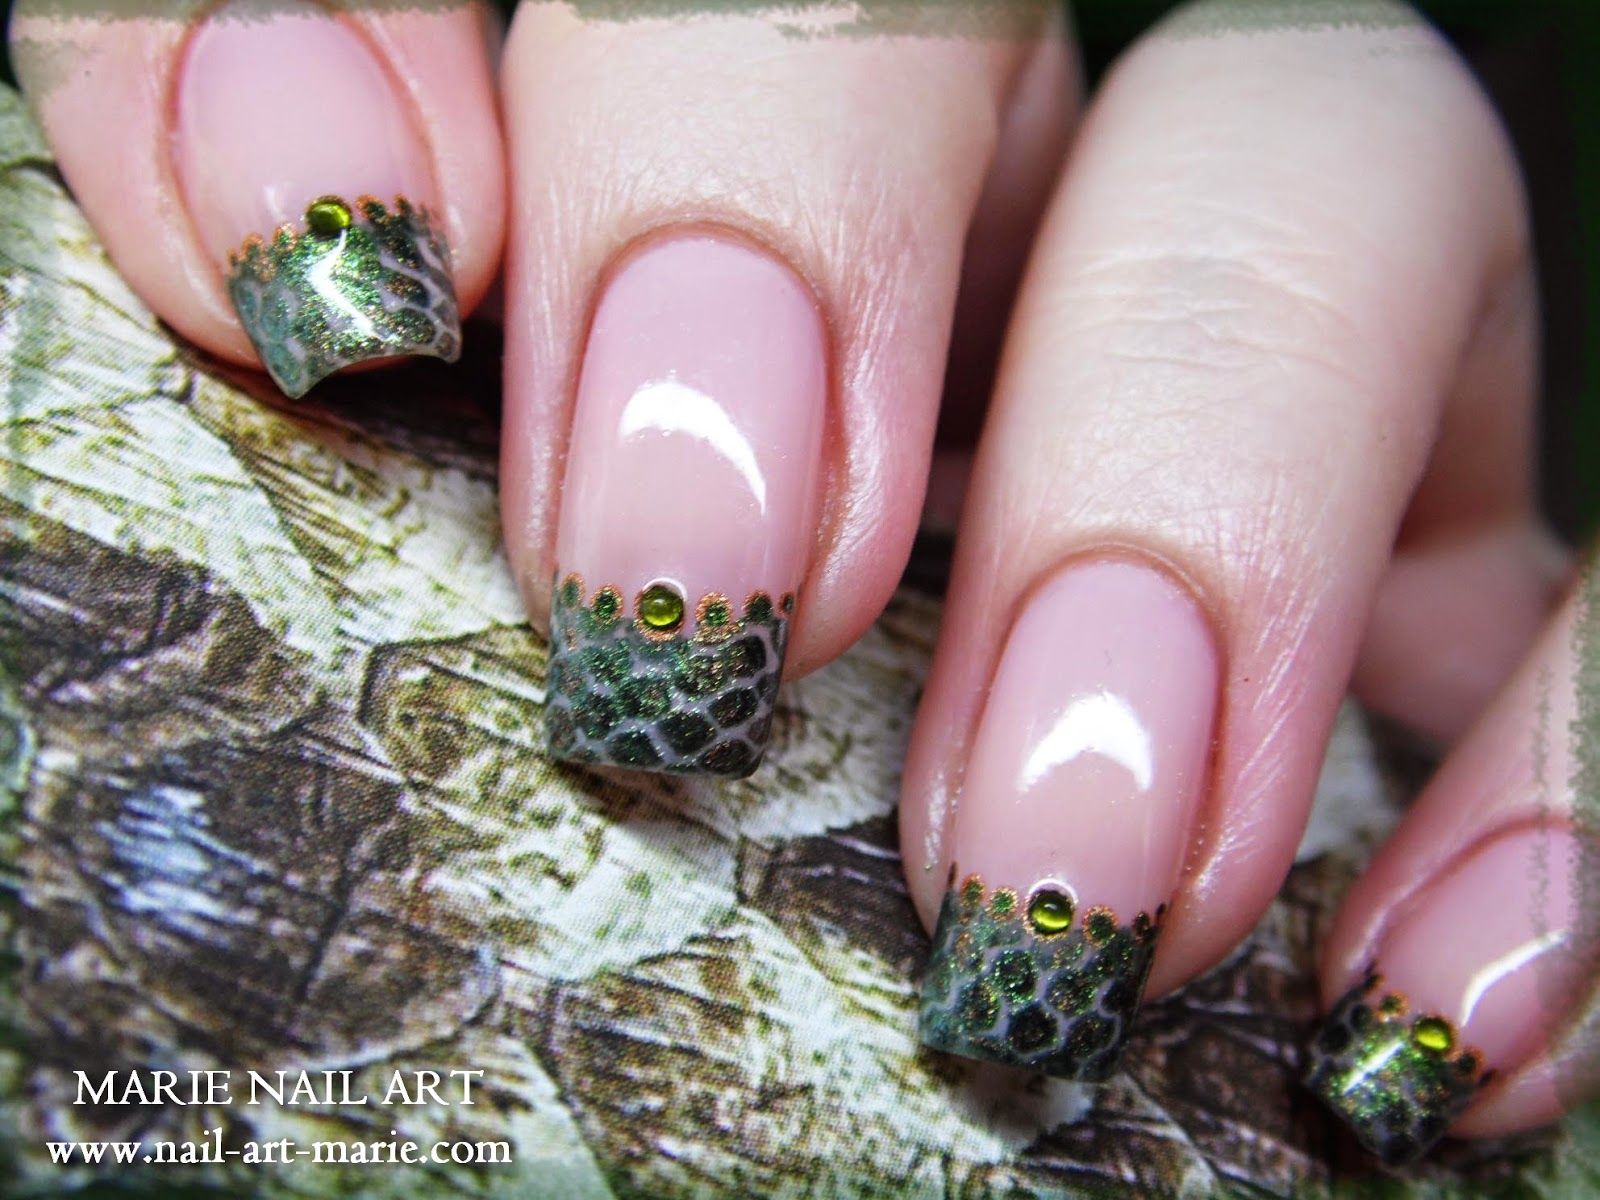 nail art effet peau de serpent7